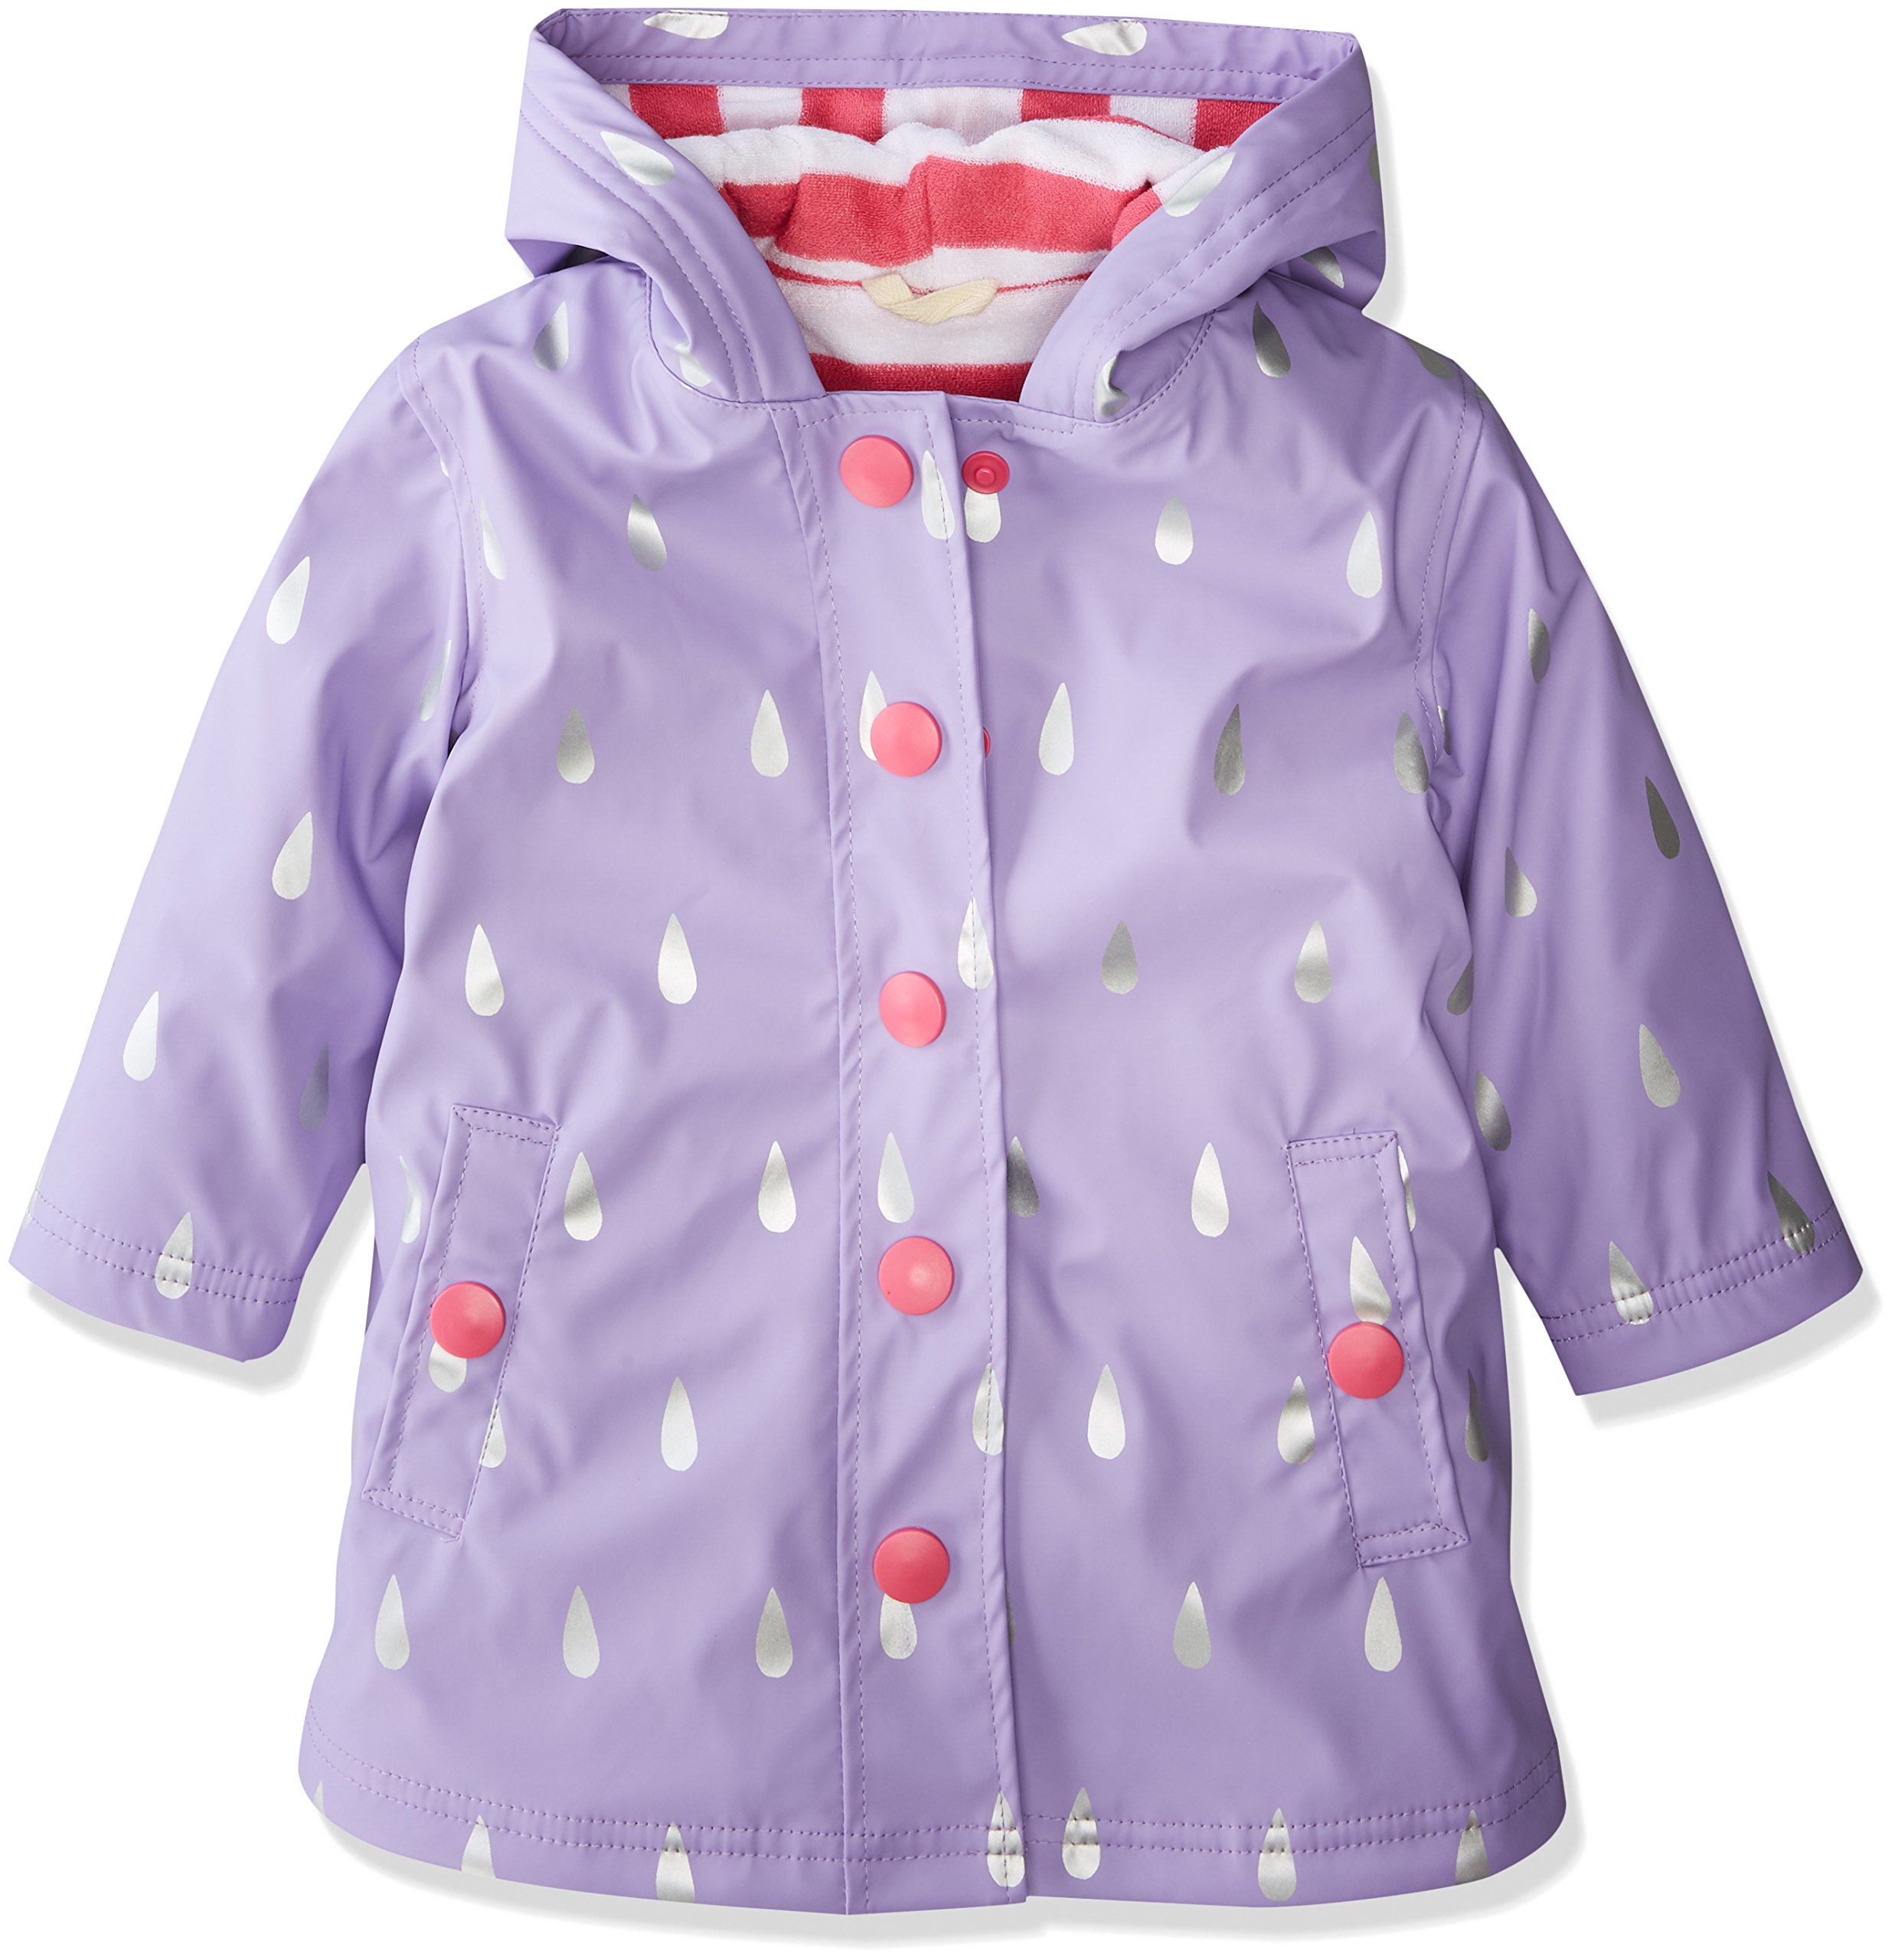 Hatley Little Girls' Splash Jackets, Silver Raindrops, 6